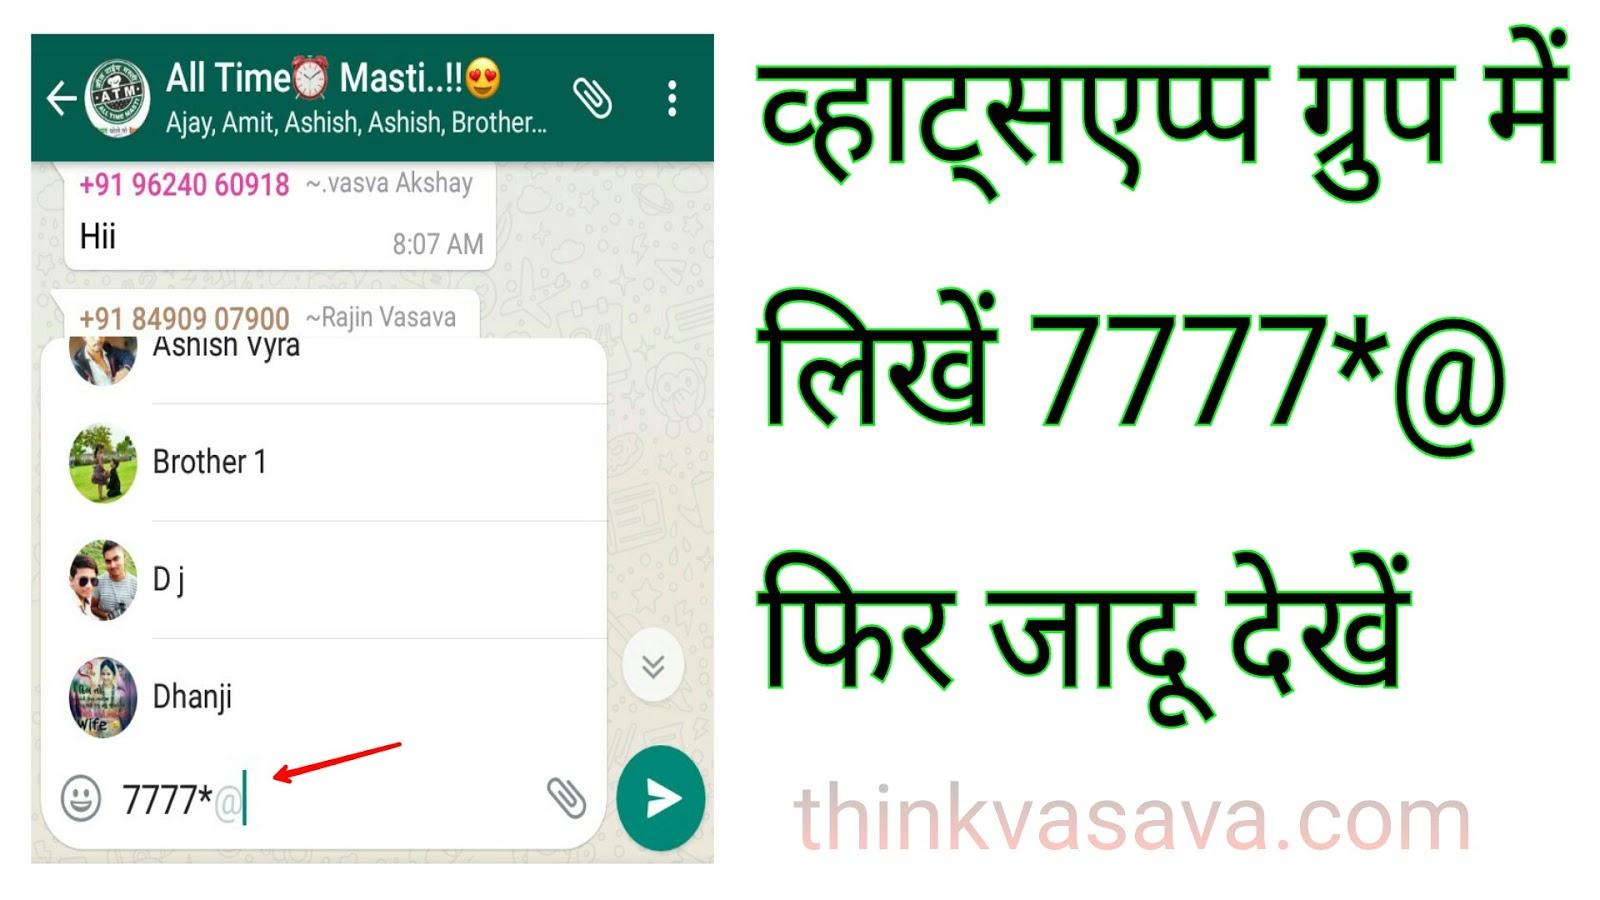 Whatsapp Me 7777*@ Likhe Or Jadu Dekhe